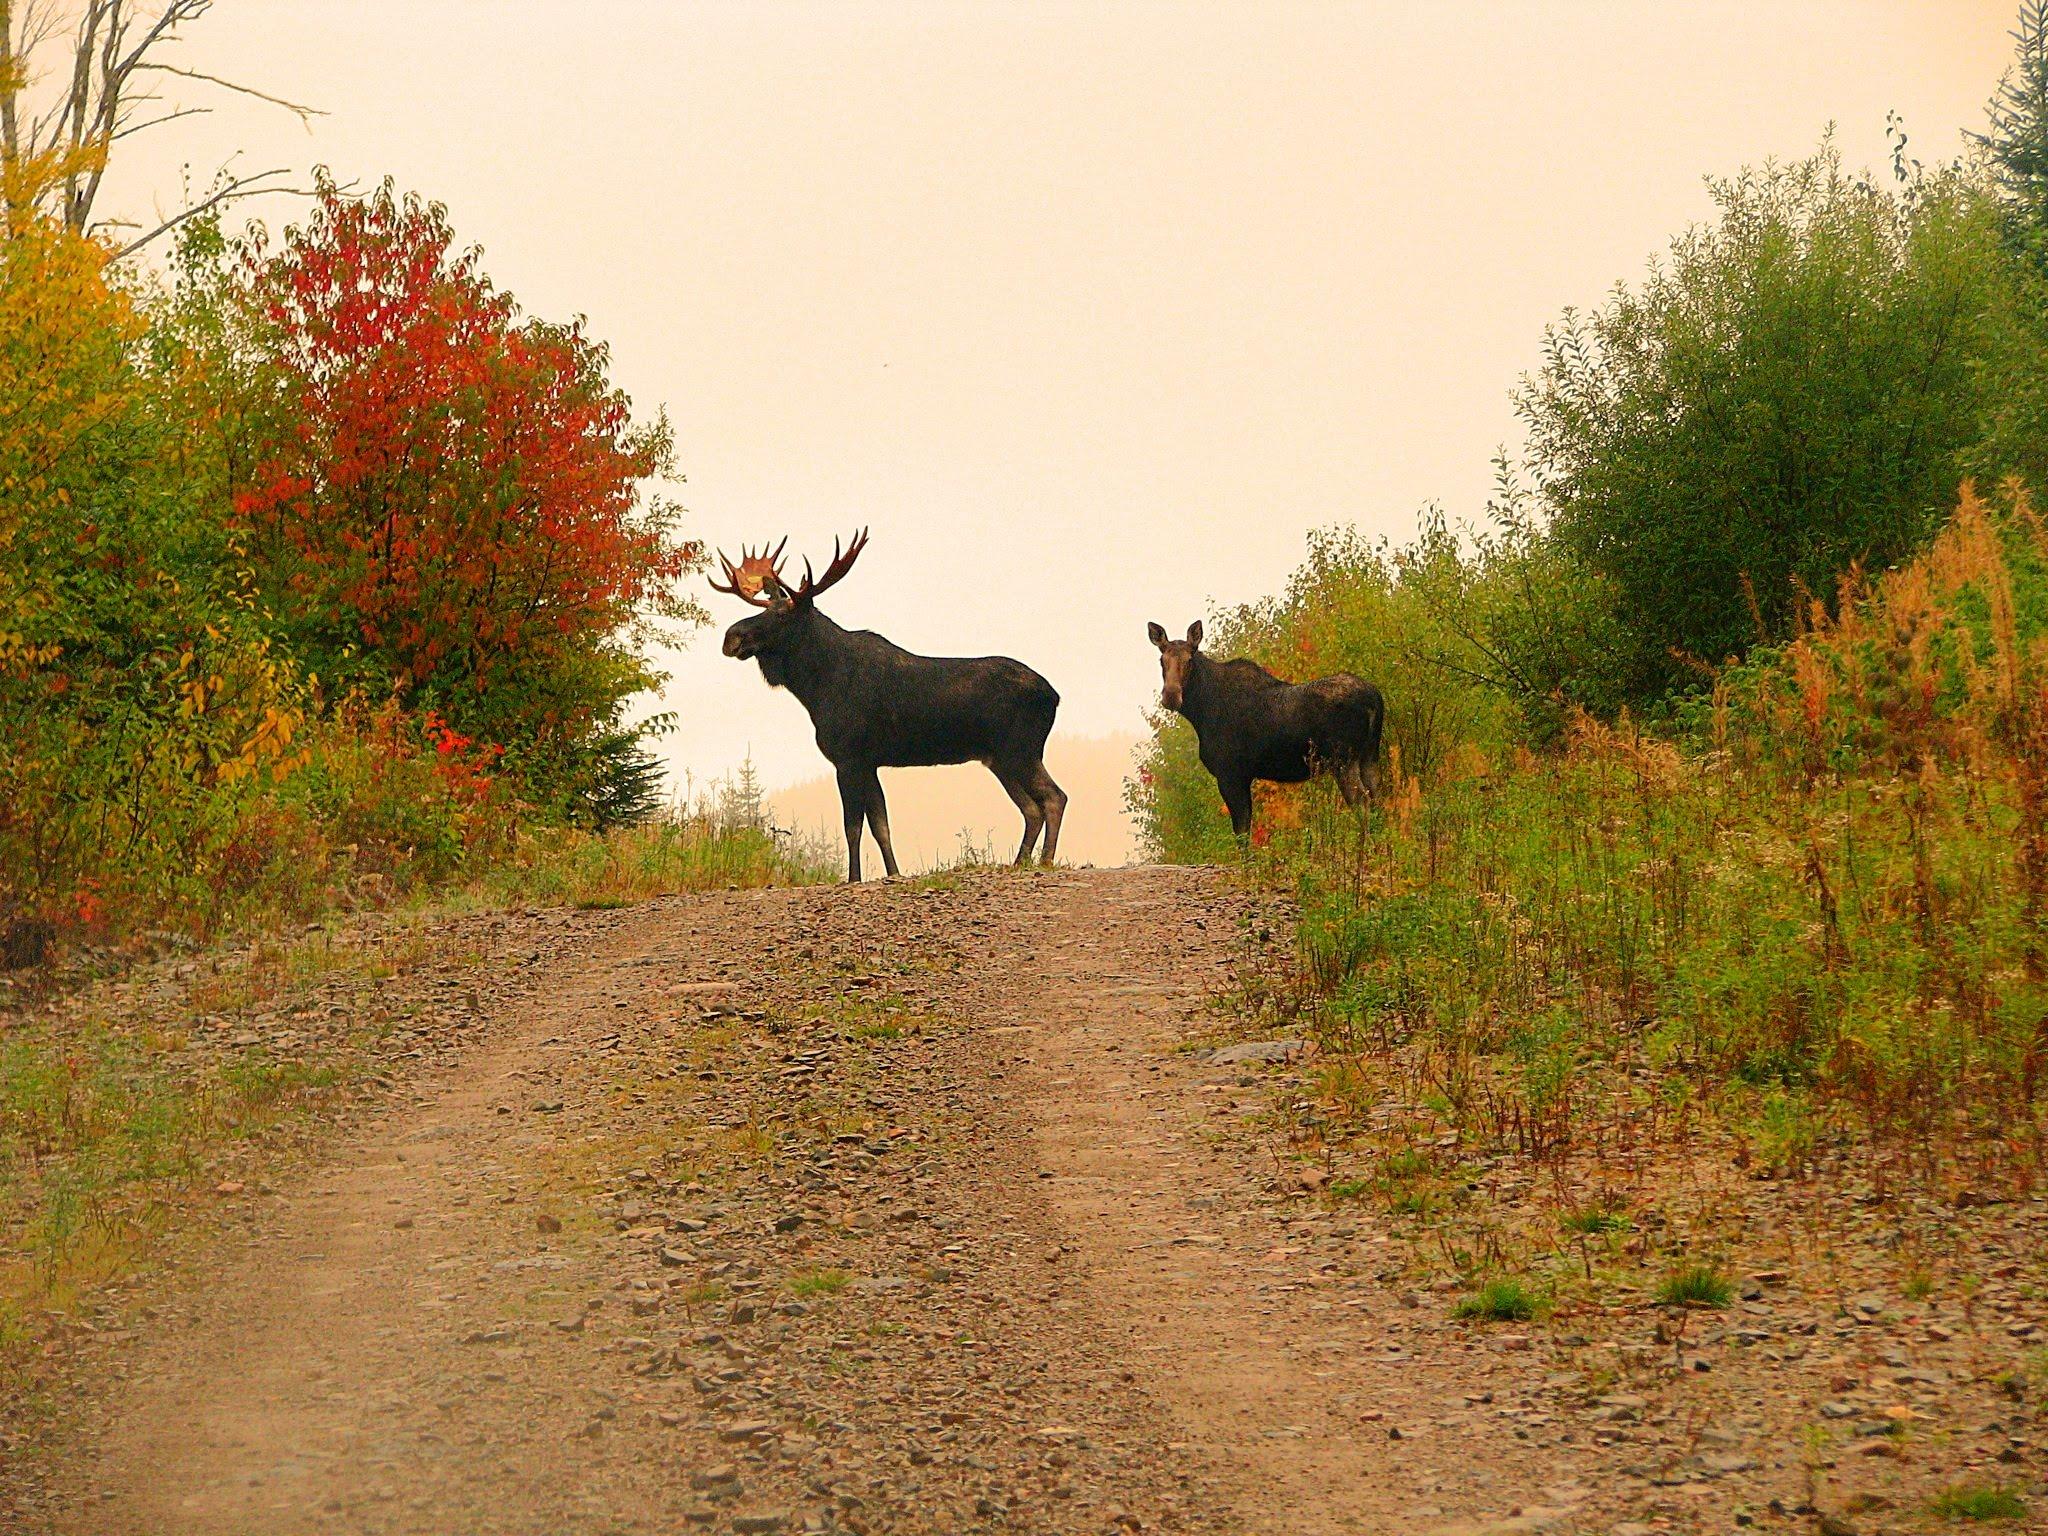 New Brunswick Hst >> Archery Moose Hunt - Wild Goose Lake Resort - Geraldton, Jellicoe, Walleye, Pike, and Fishing Resort